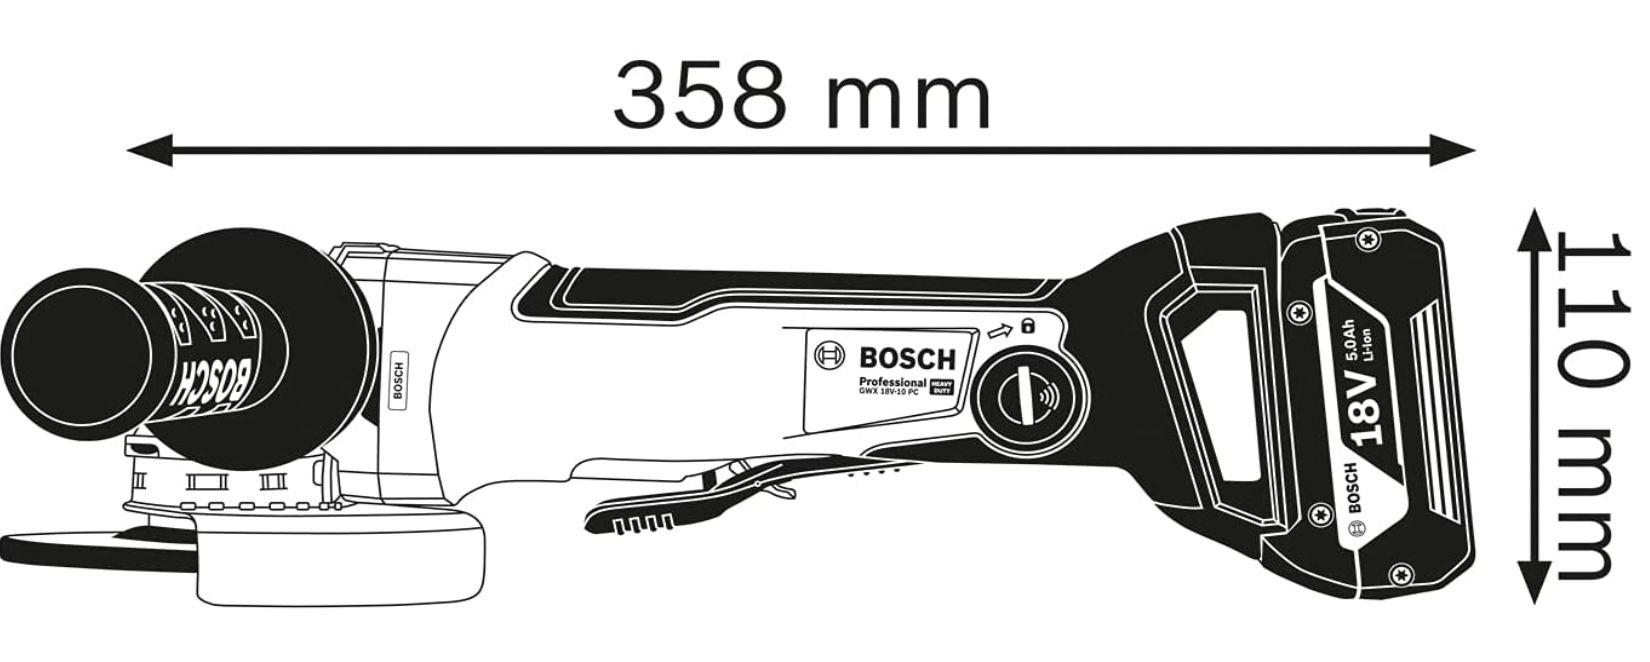 Bosch Professional GWX 18V 10 PC Akku Winkelschleifer für 149€ (statt 179€)